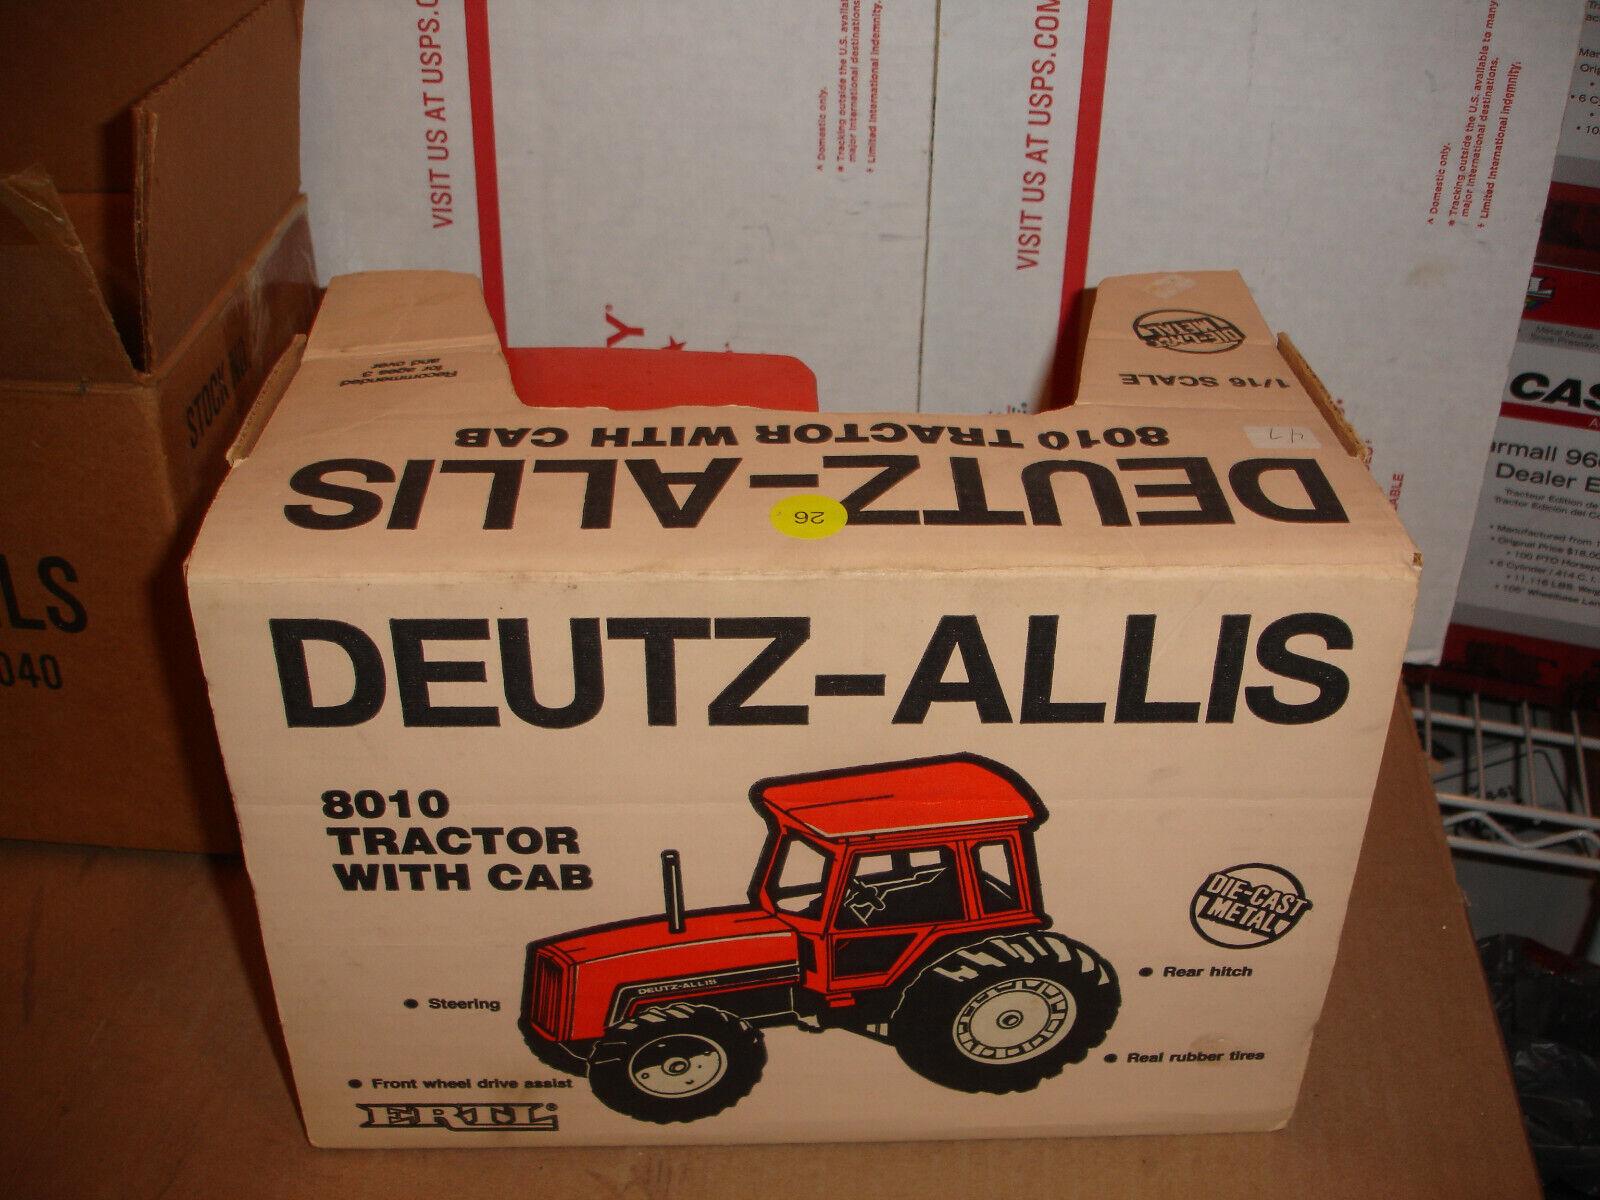 1/16 deutz allis toy tractor 8010